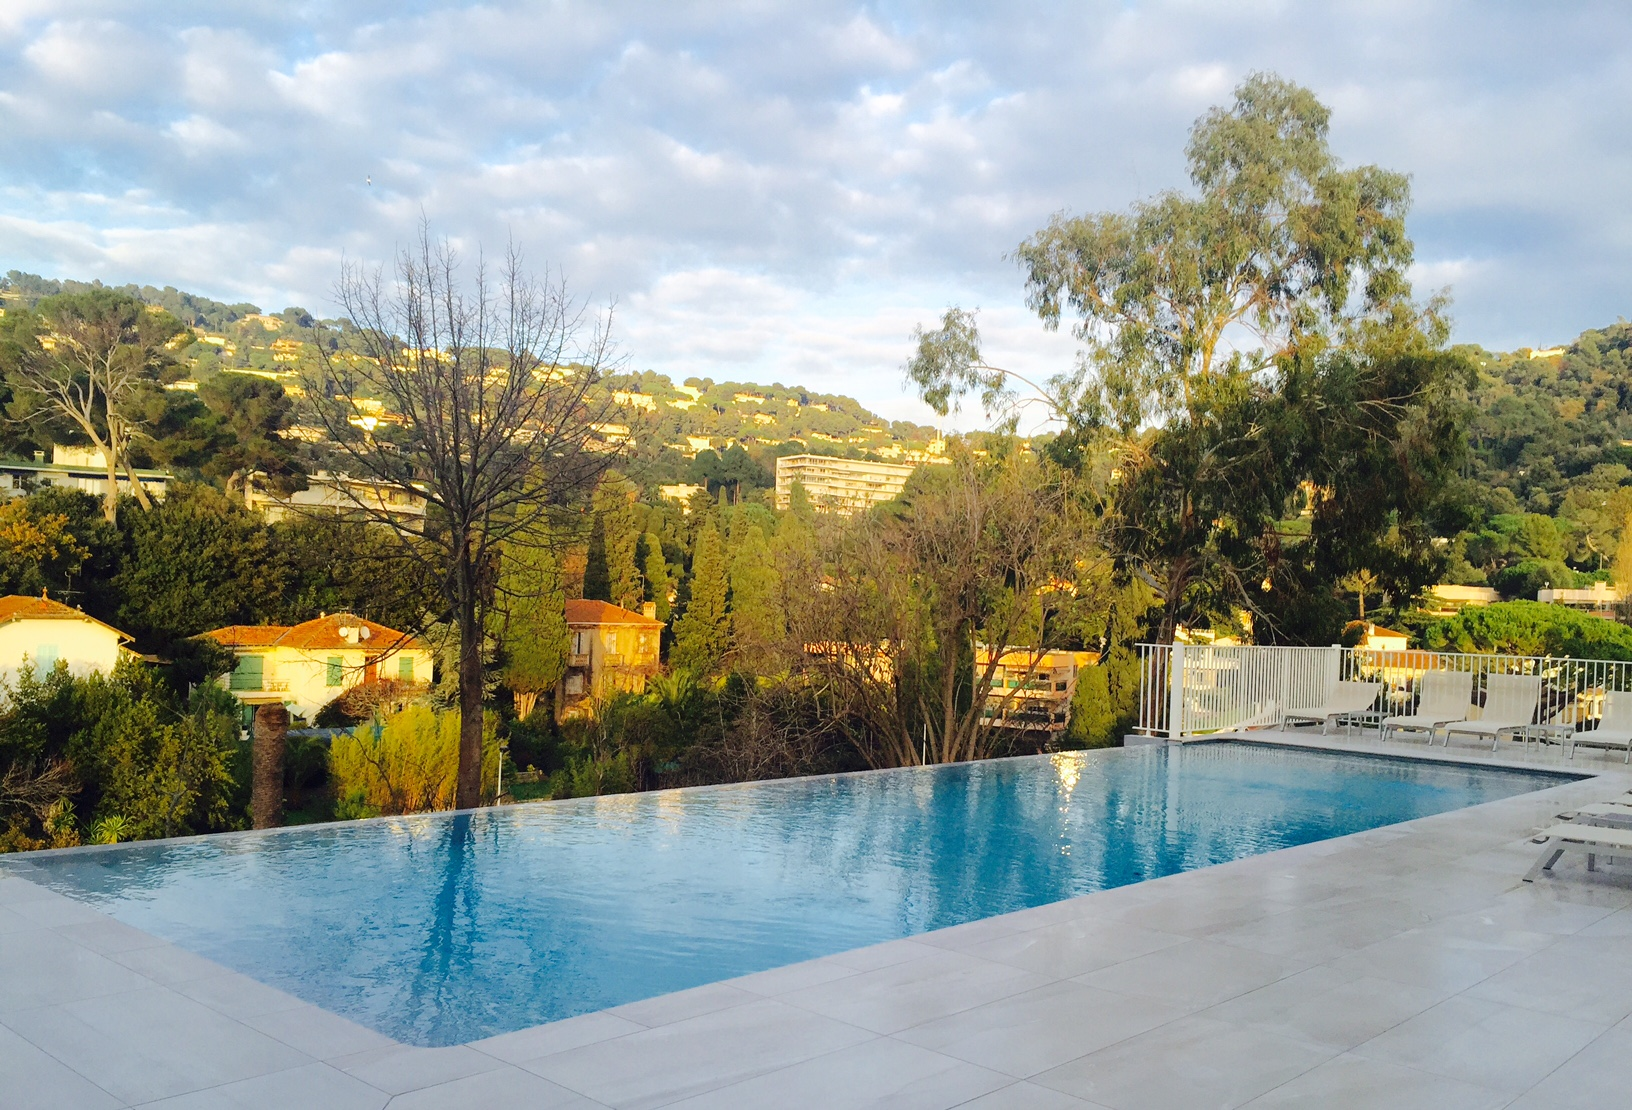 Pool of the hotel La Bastide de l'Oliveraie